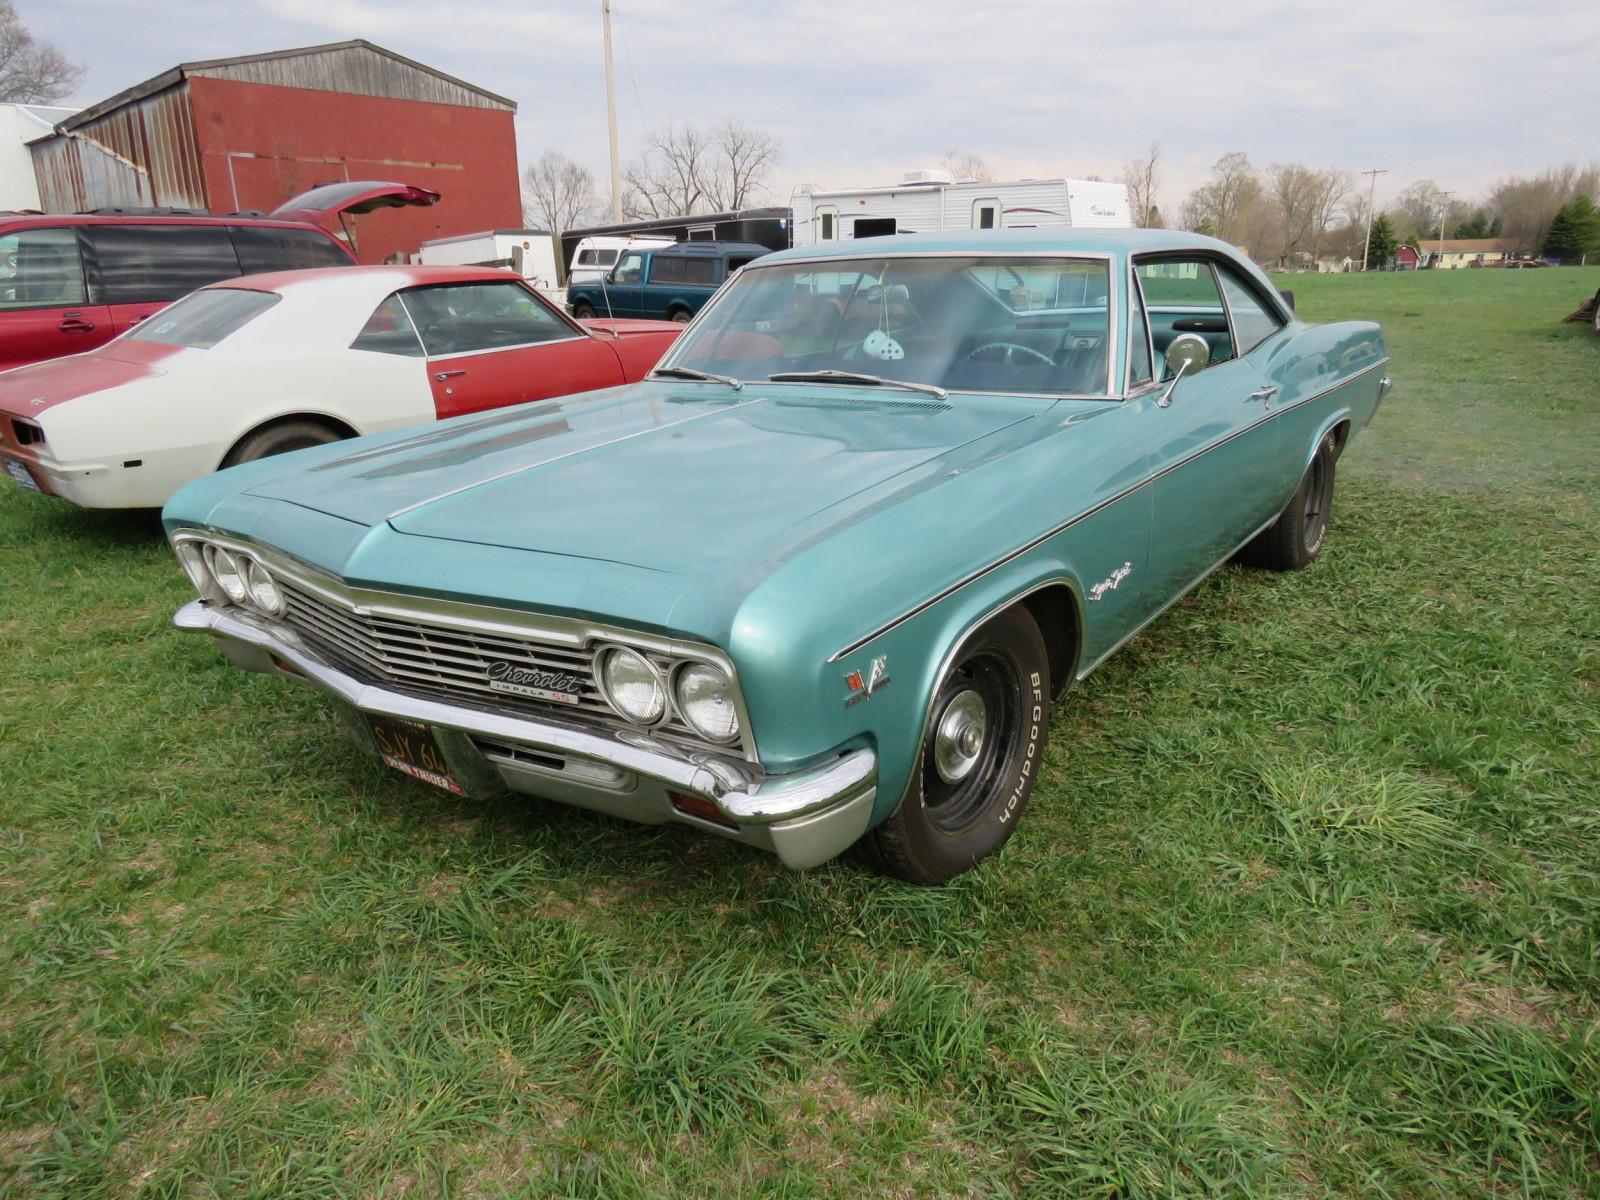 Lot 12v 1966 Chevrolet Impala Ss Vanderbrink Auctions Image 3